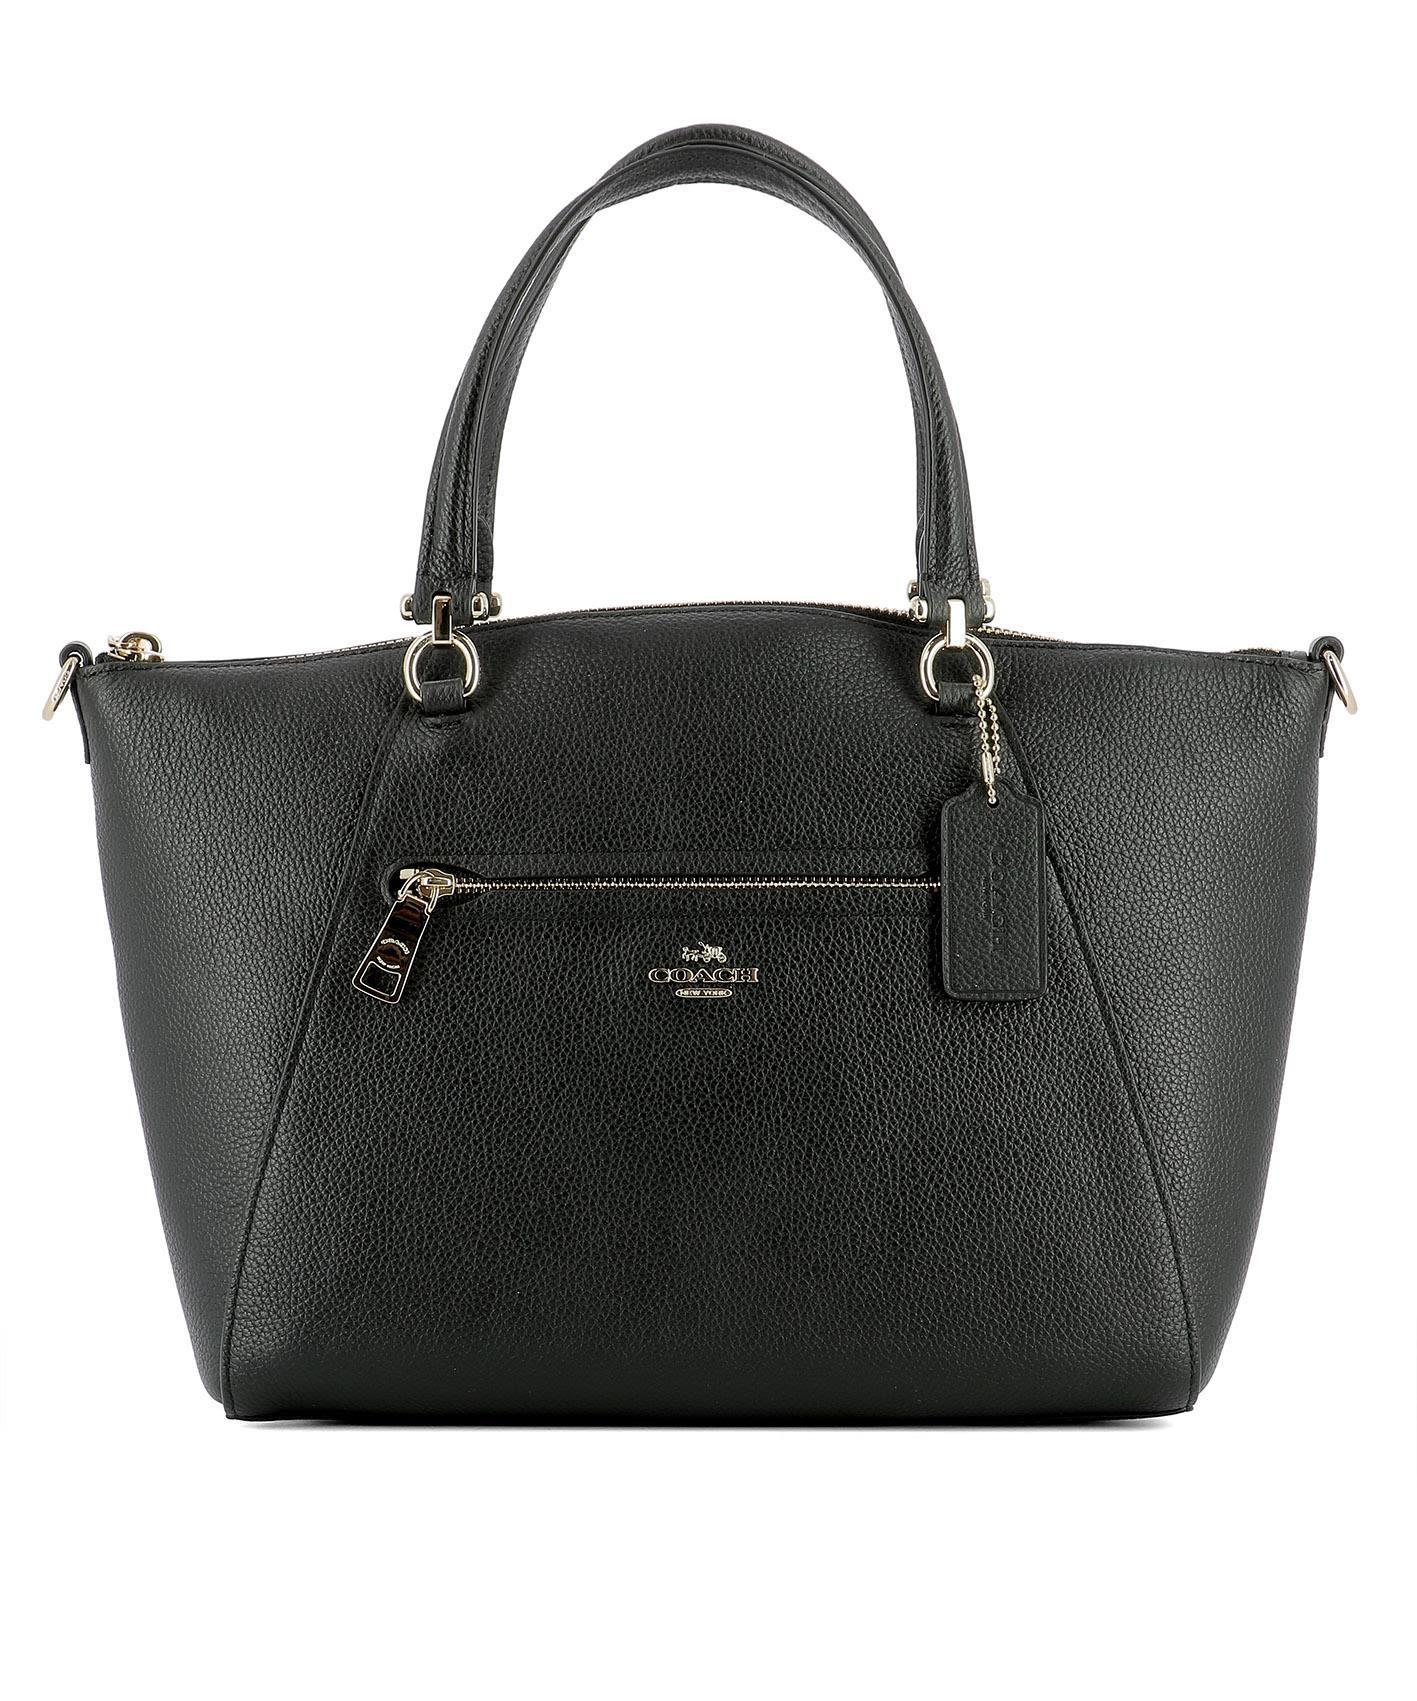 Coach Black Leather Handle Bag